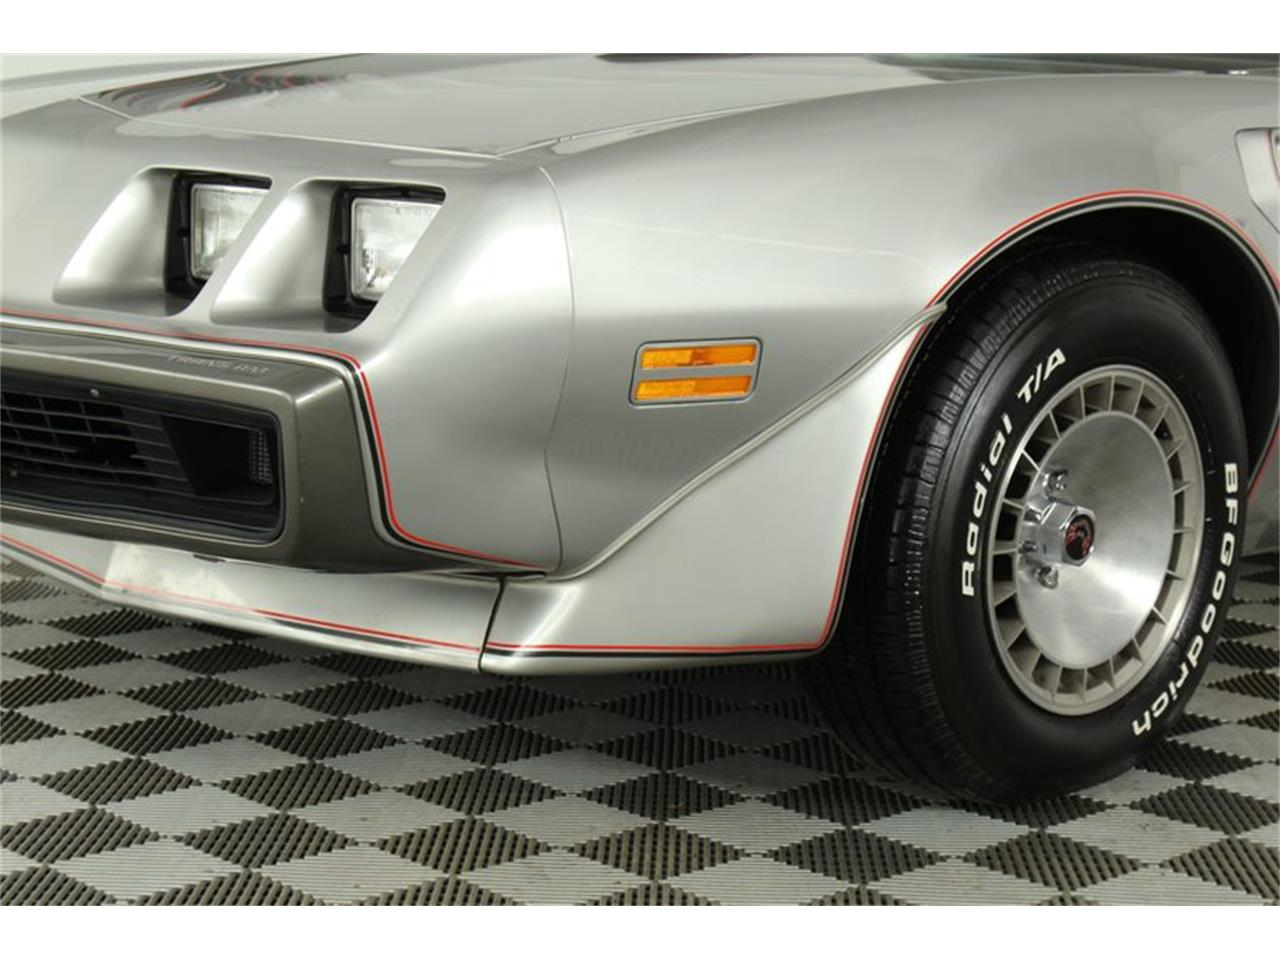 Large Picture of '79 Pontiac Firebird Trans Am - $39,900.00 - Q6YC